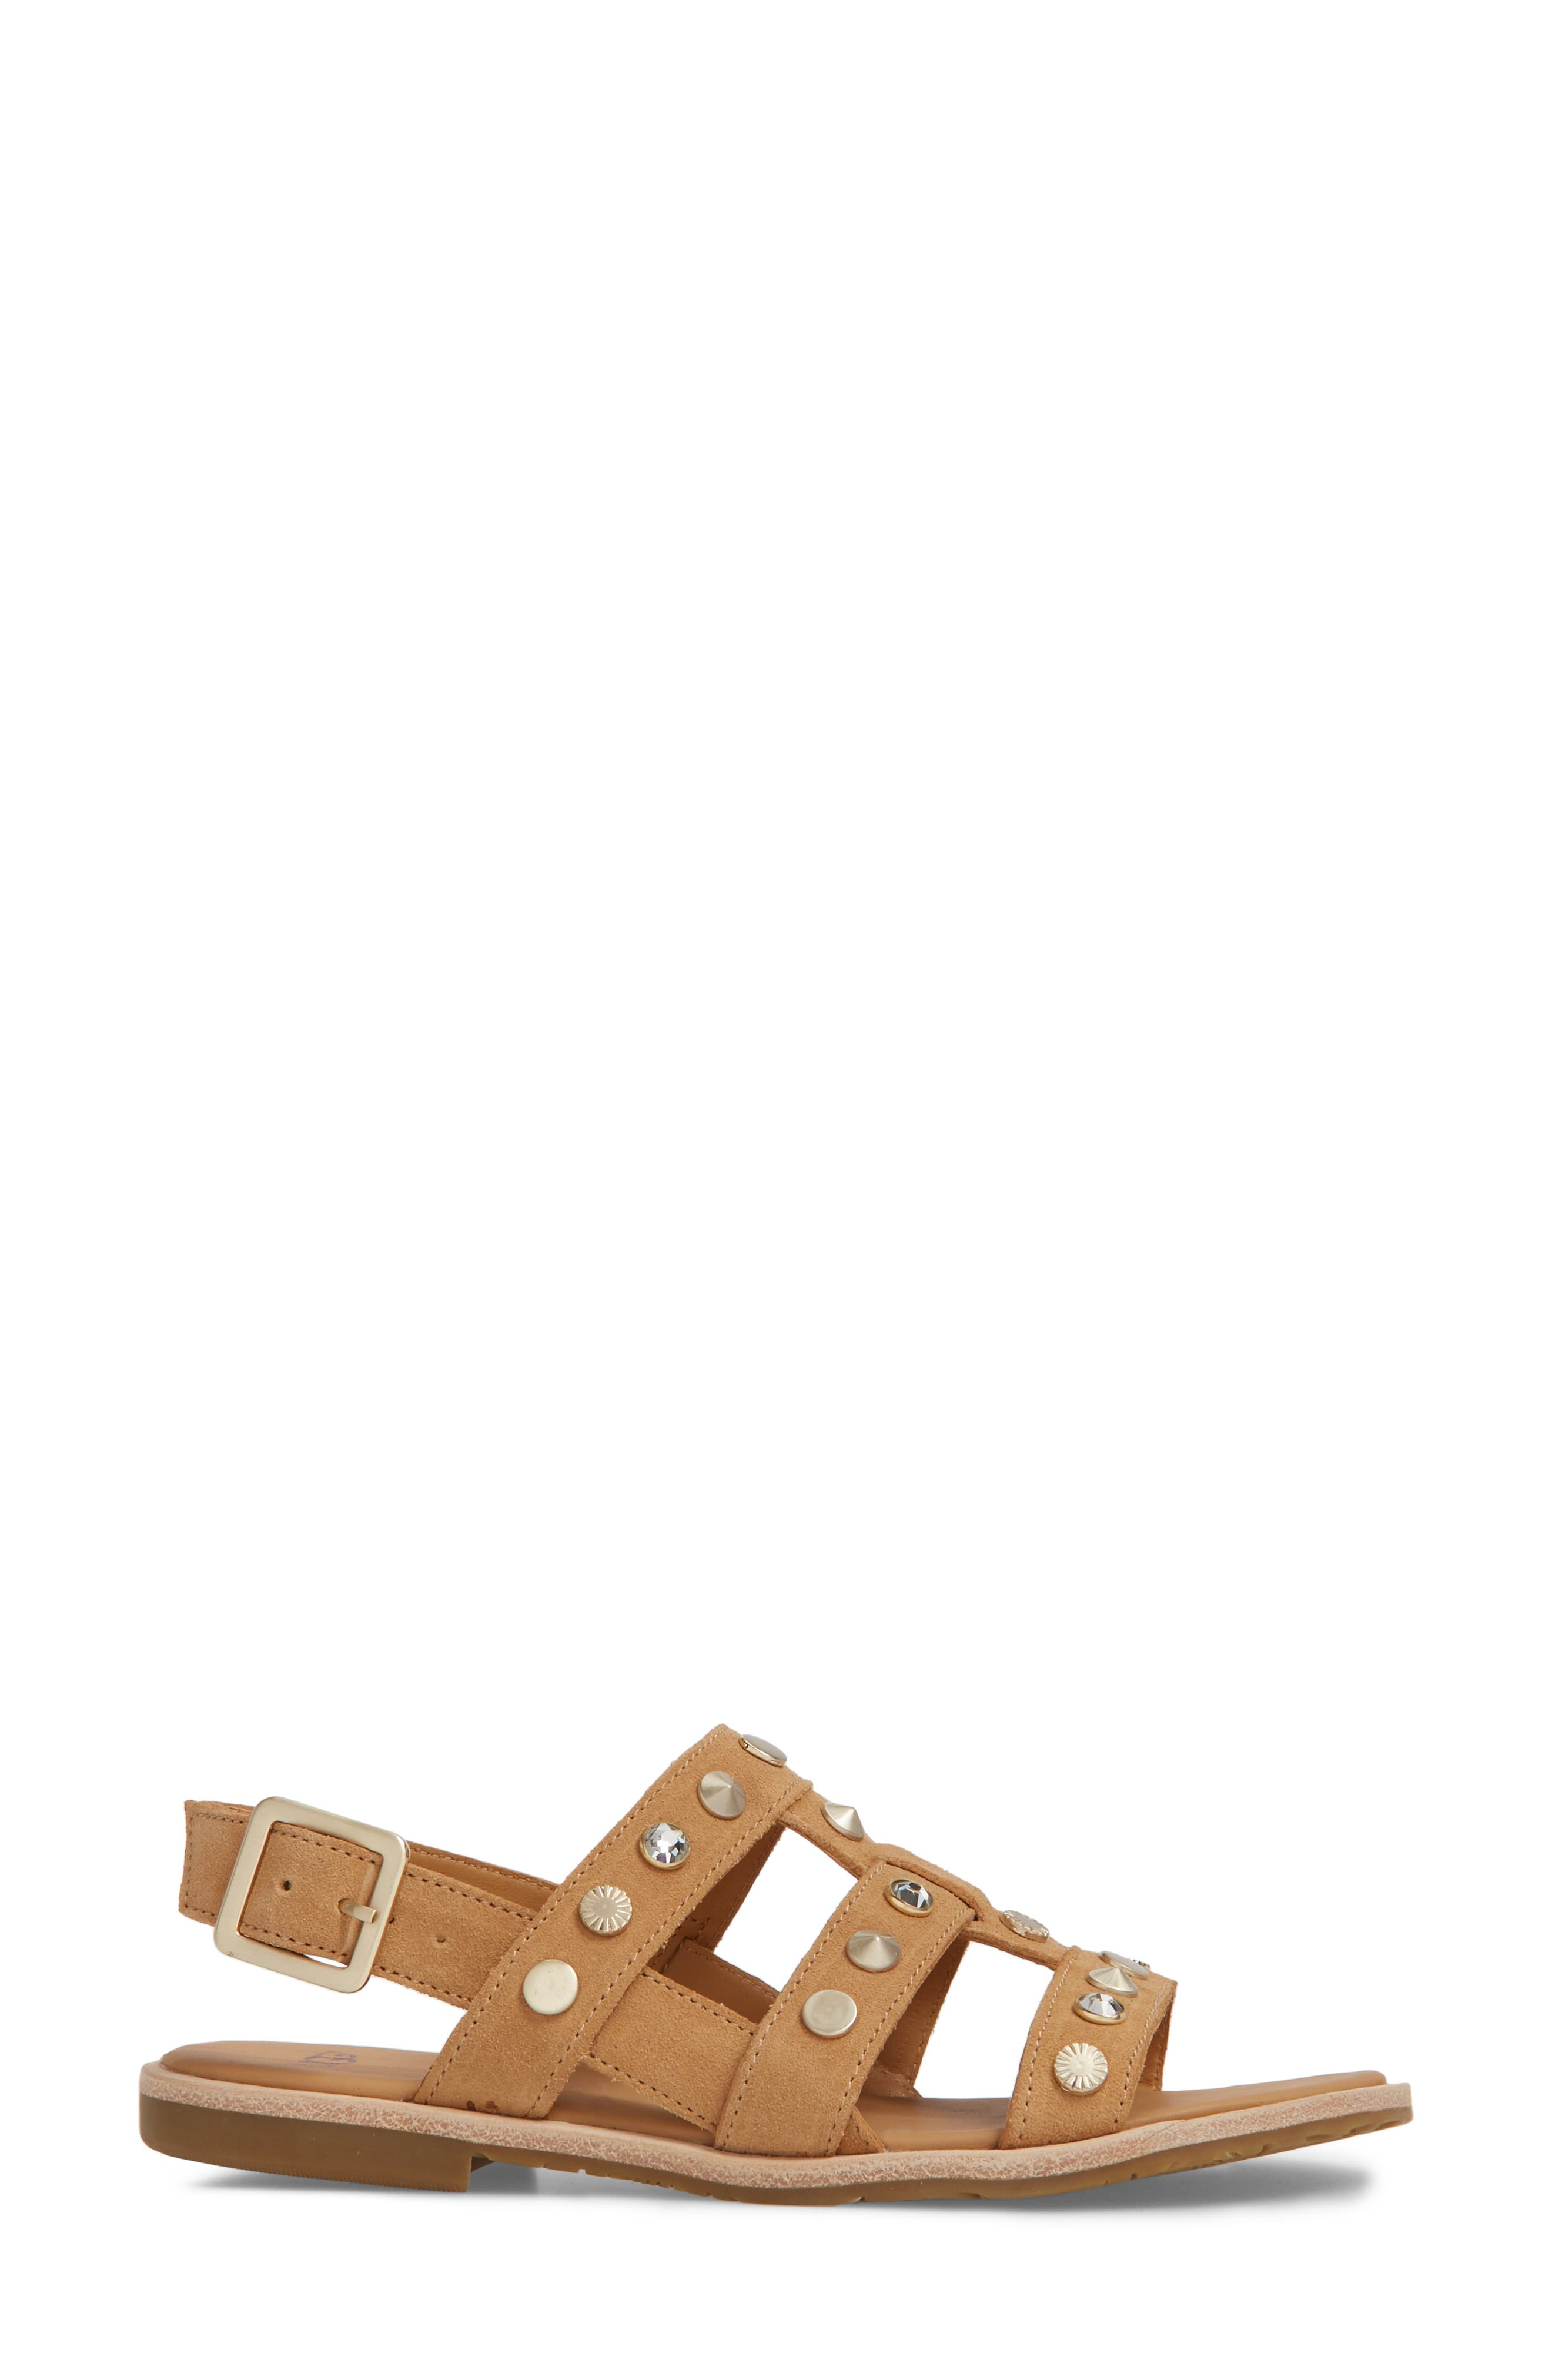 Zariah Studded Sandal,                             Alternate thumbnail 3, color,                             Latte Suede